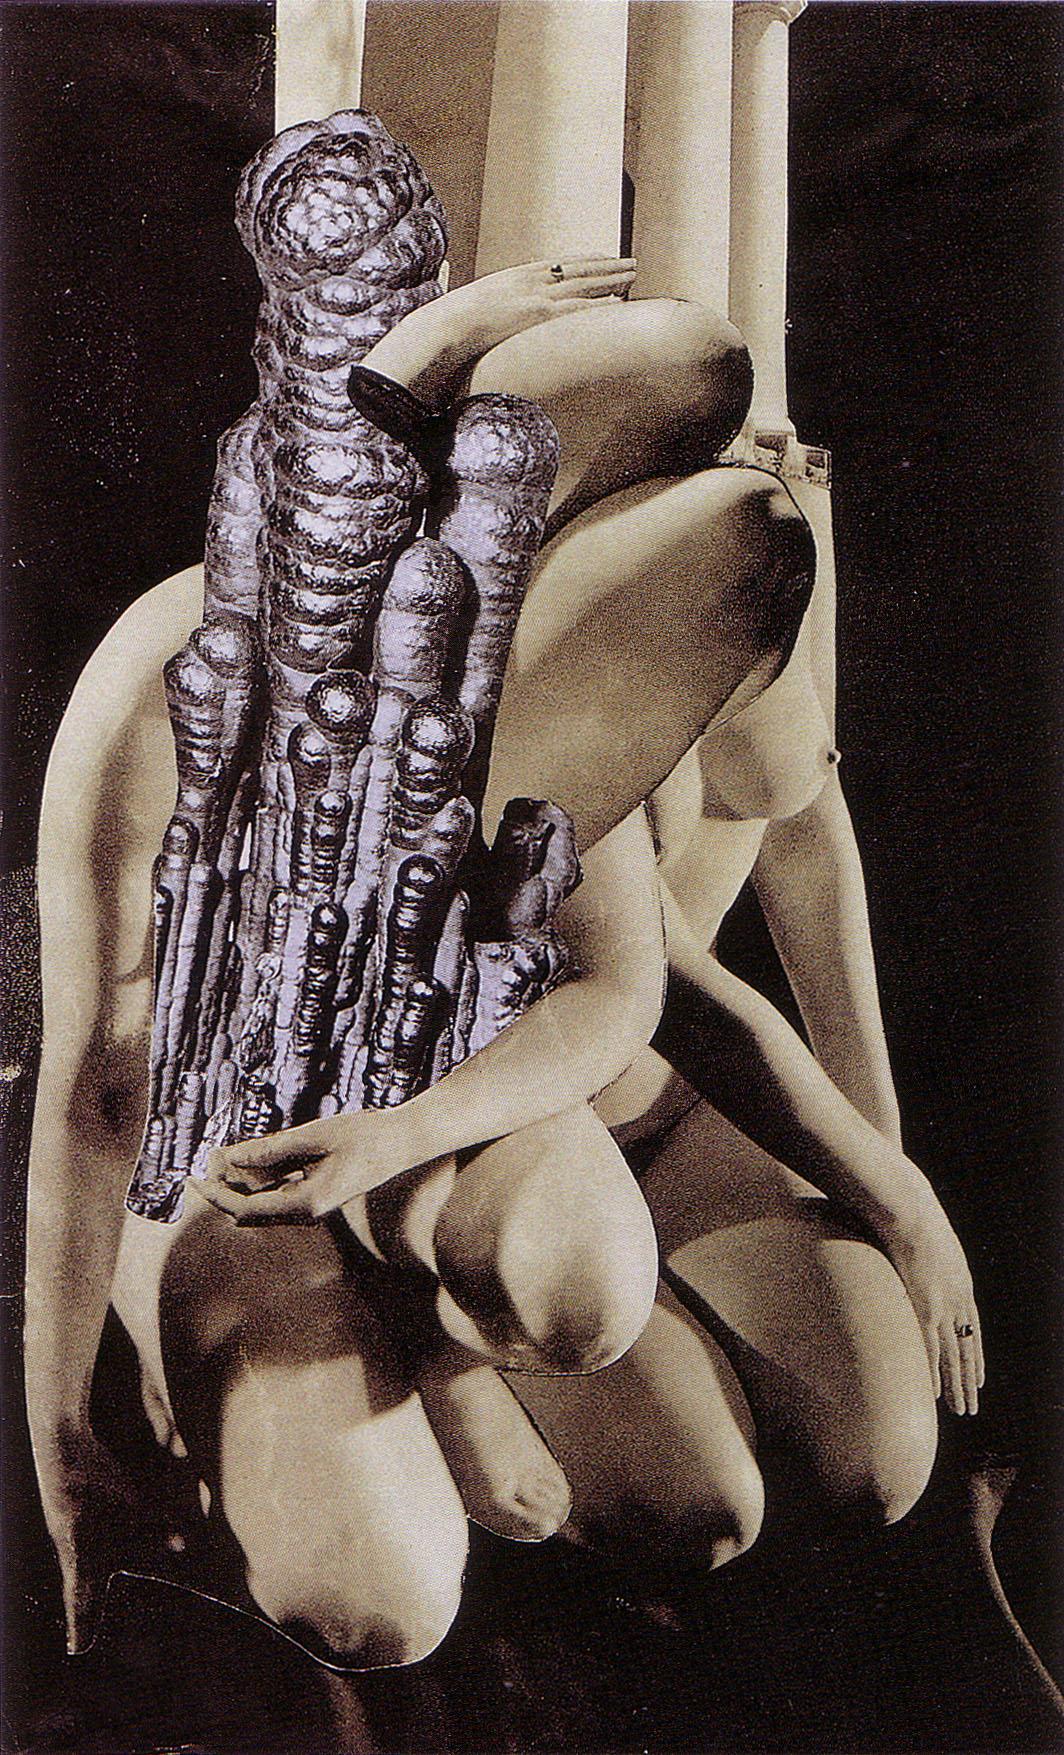 Karel Teige, collage 143, 1940. Source: Karel Teige.